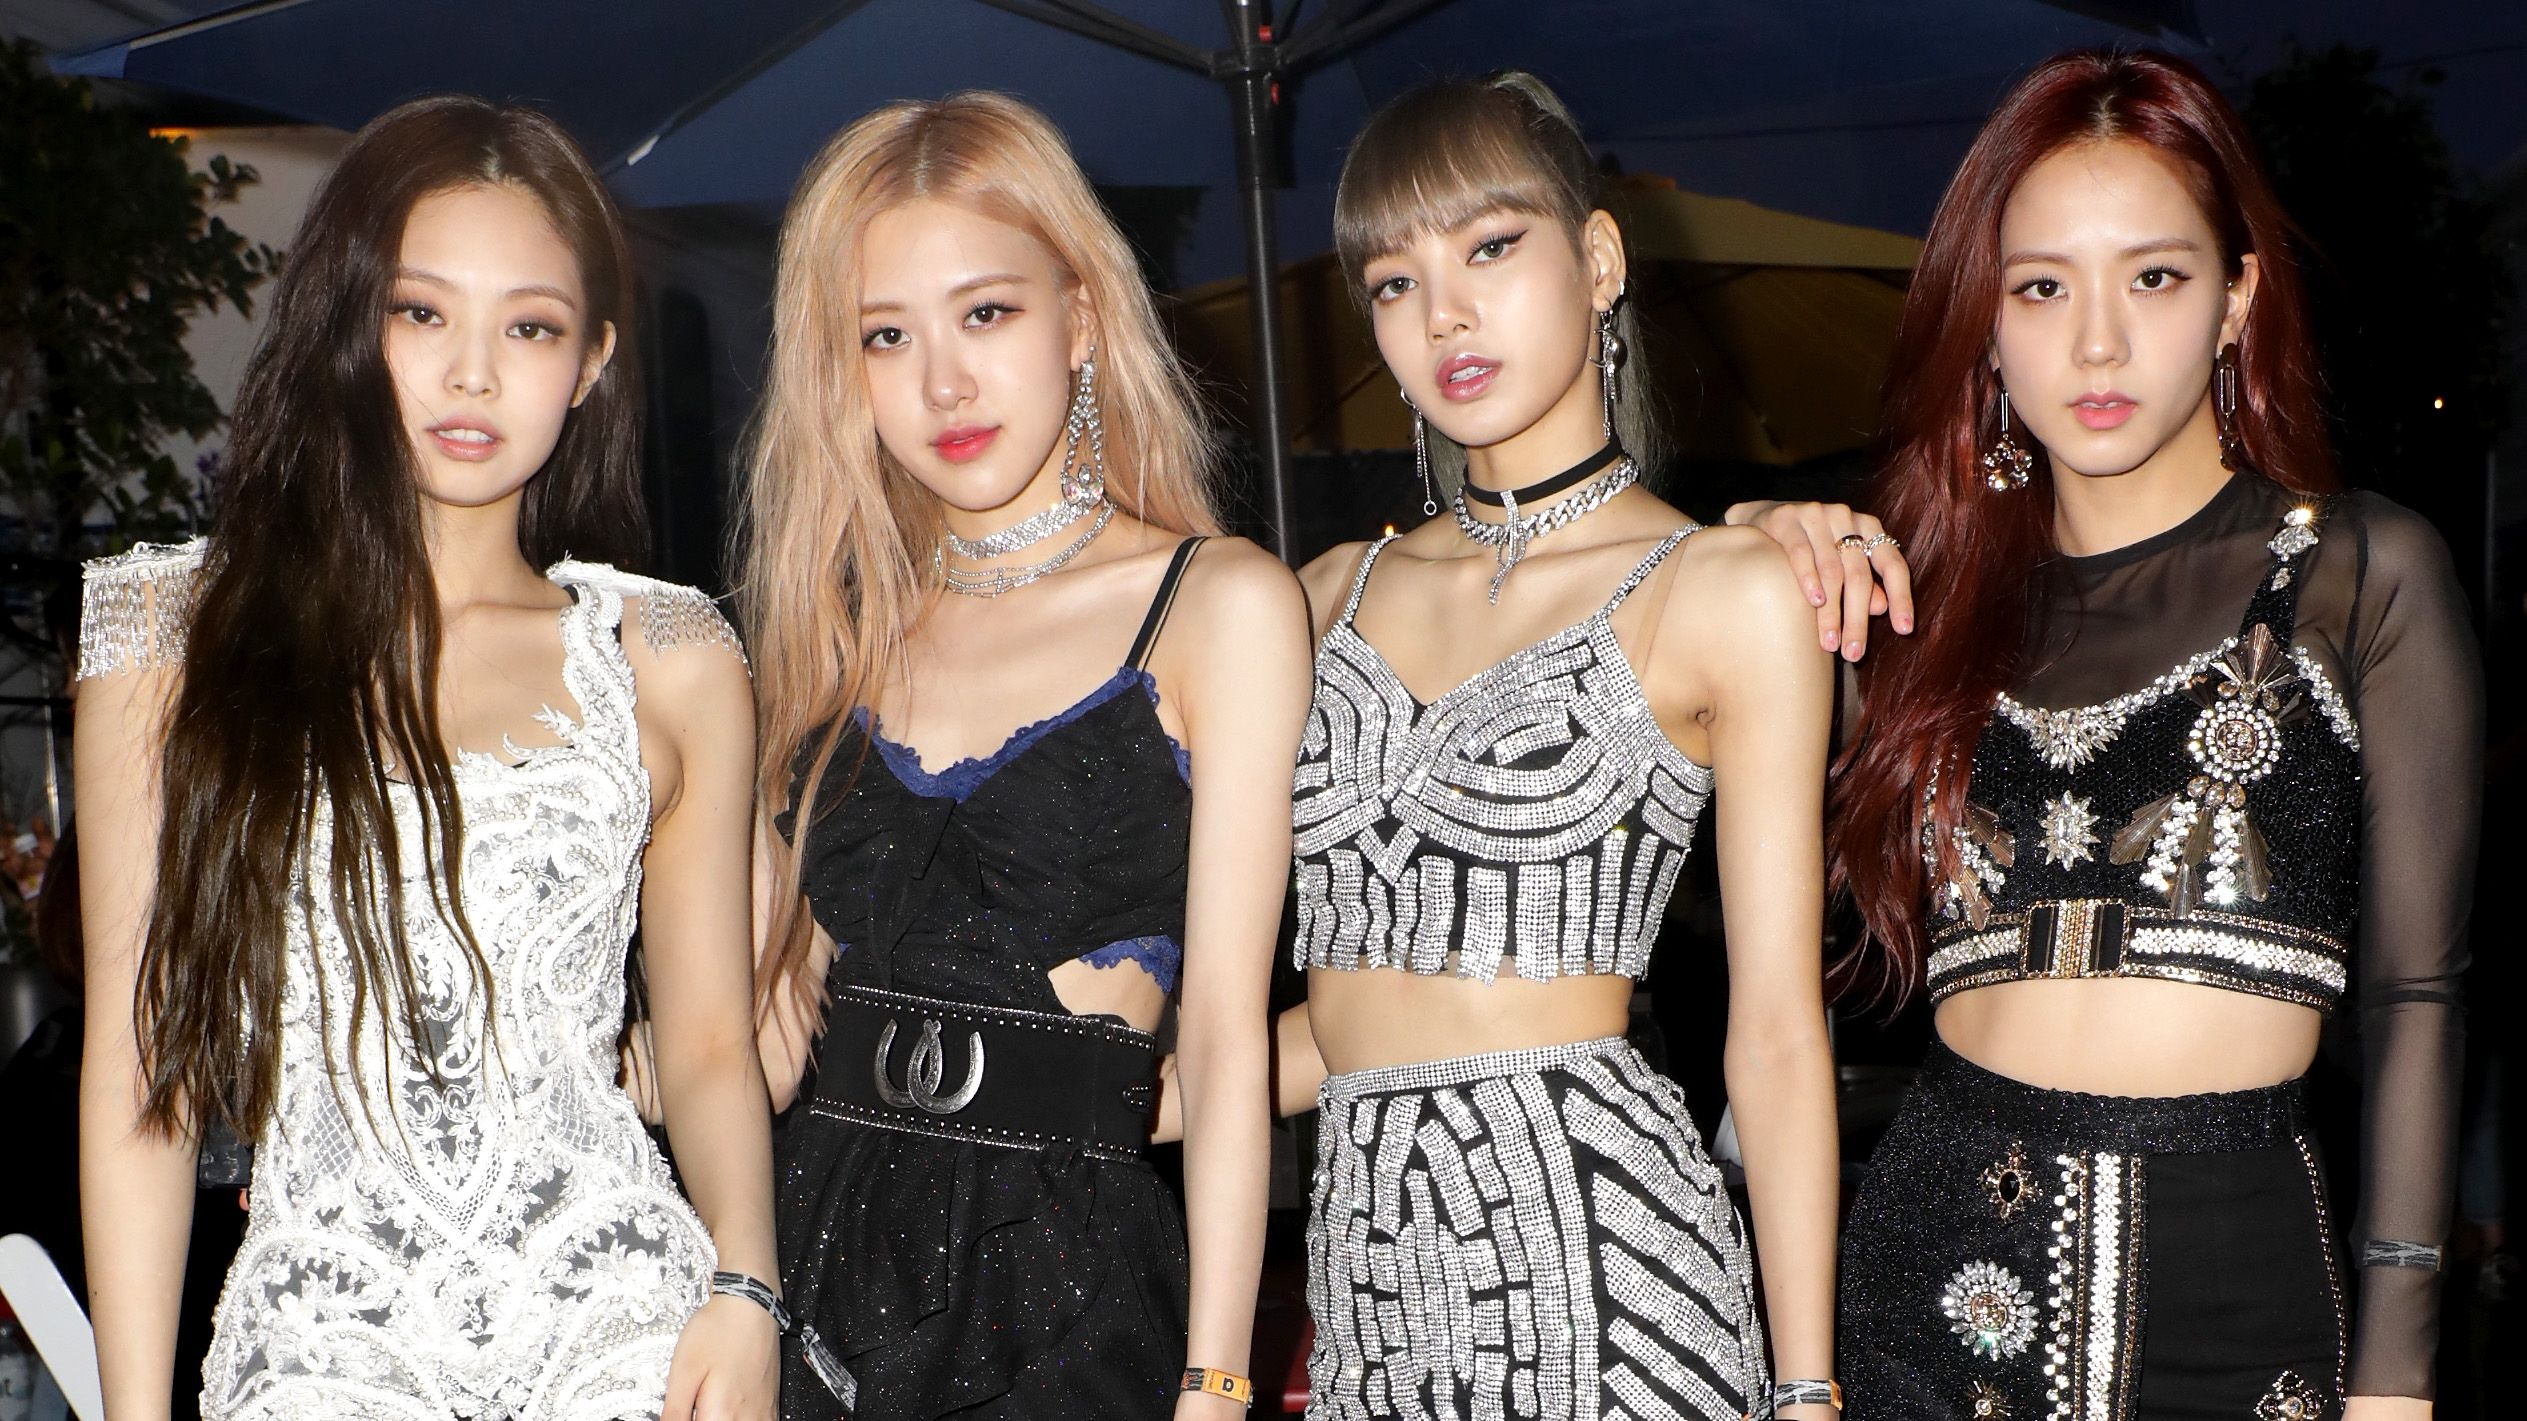 Quién es Blackpink? El grupo de K-pop que ha roto el récord de Youtube